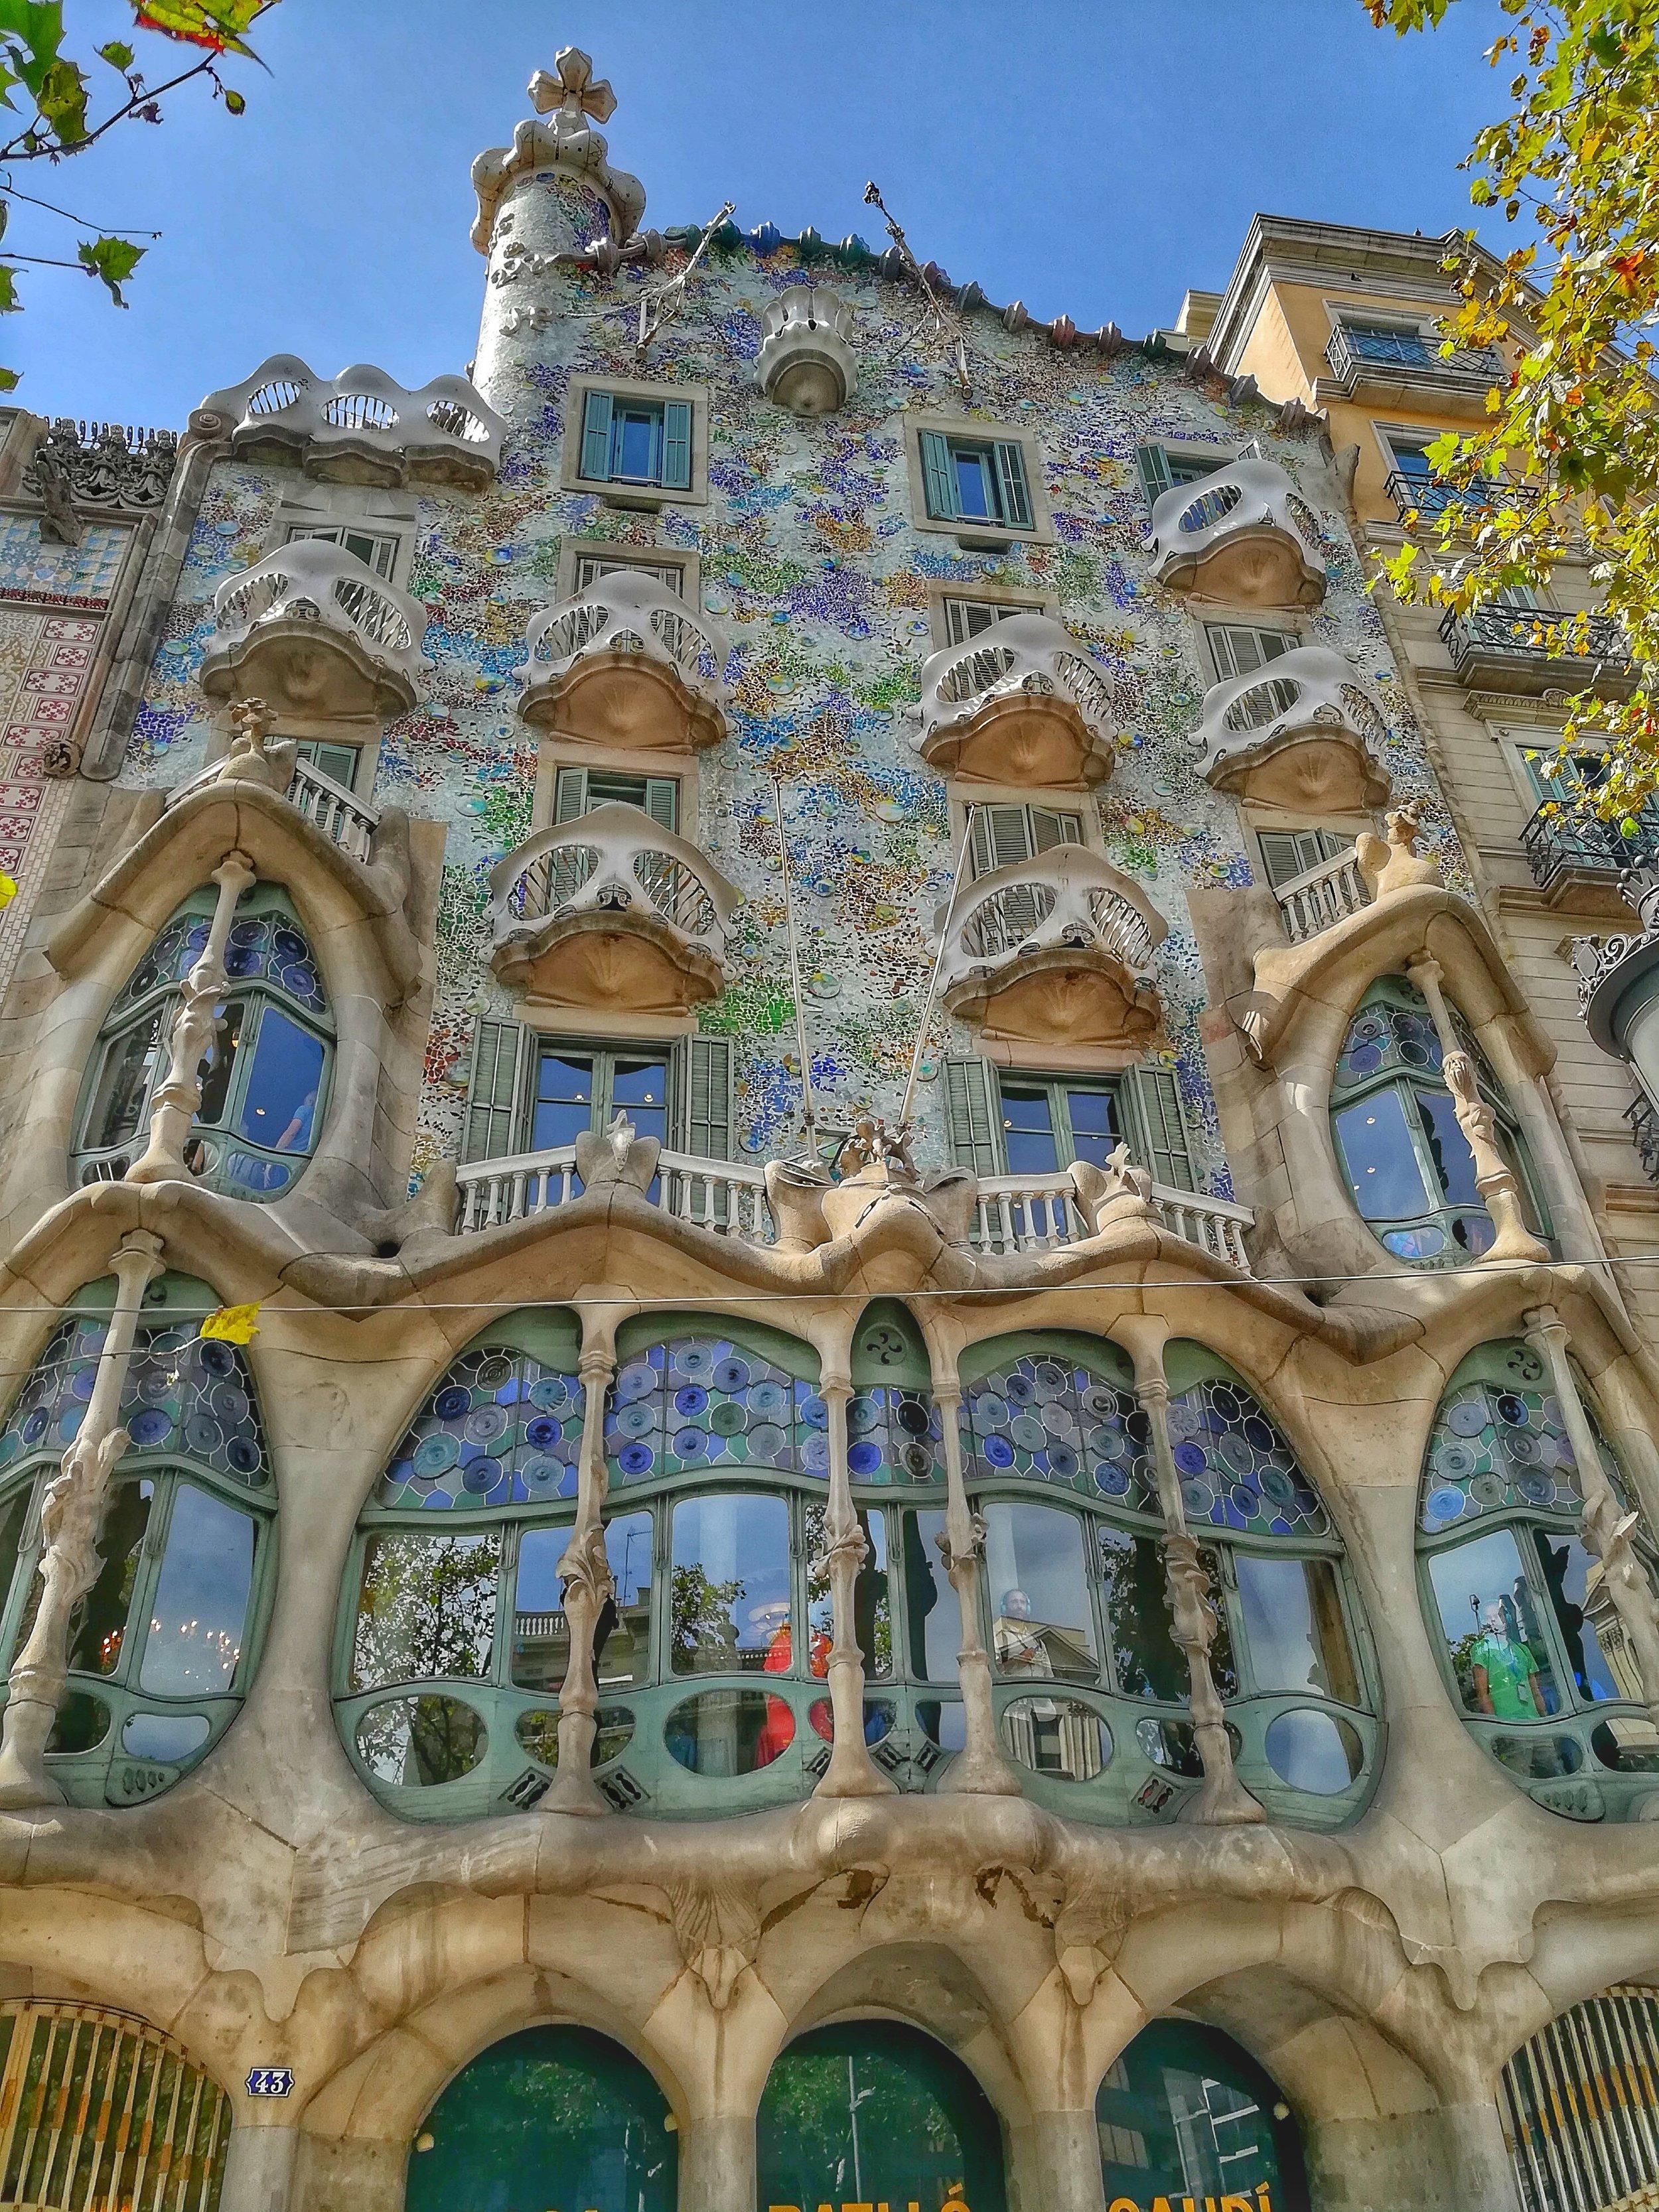 Spain breeds them odd lol. Gaudis work